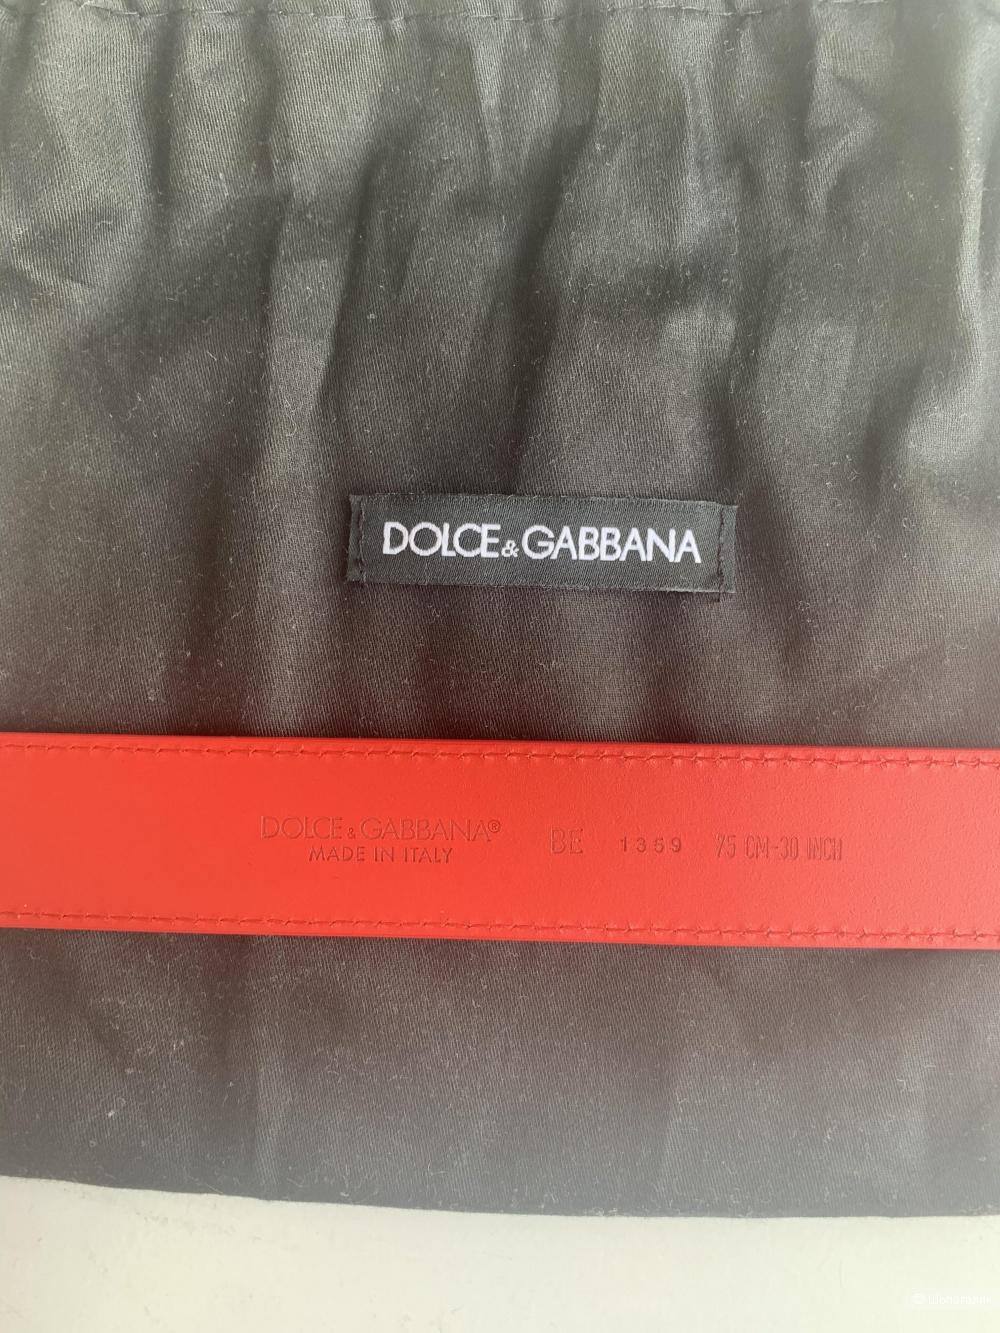 Ремень Dolce&Gabbana, p. 75